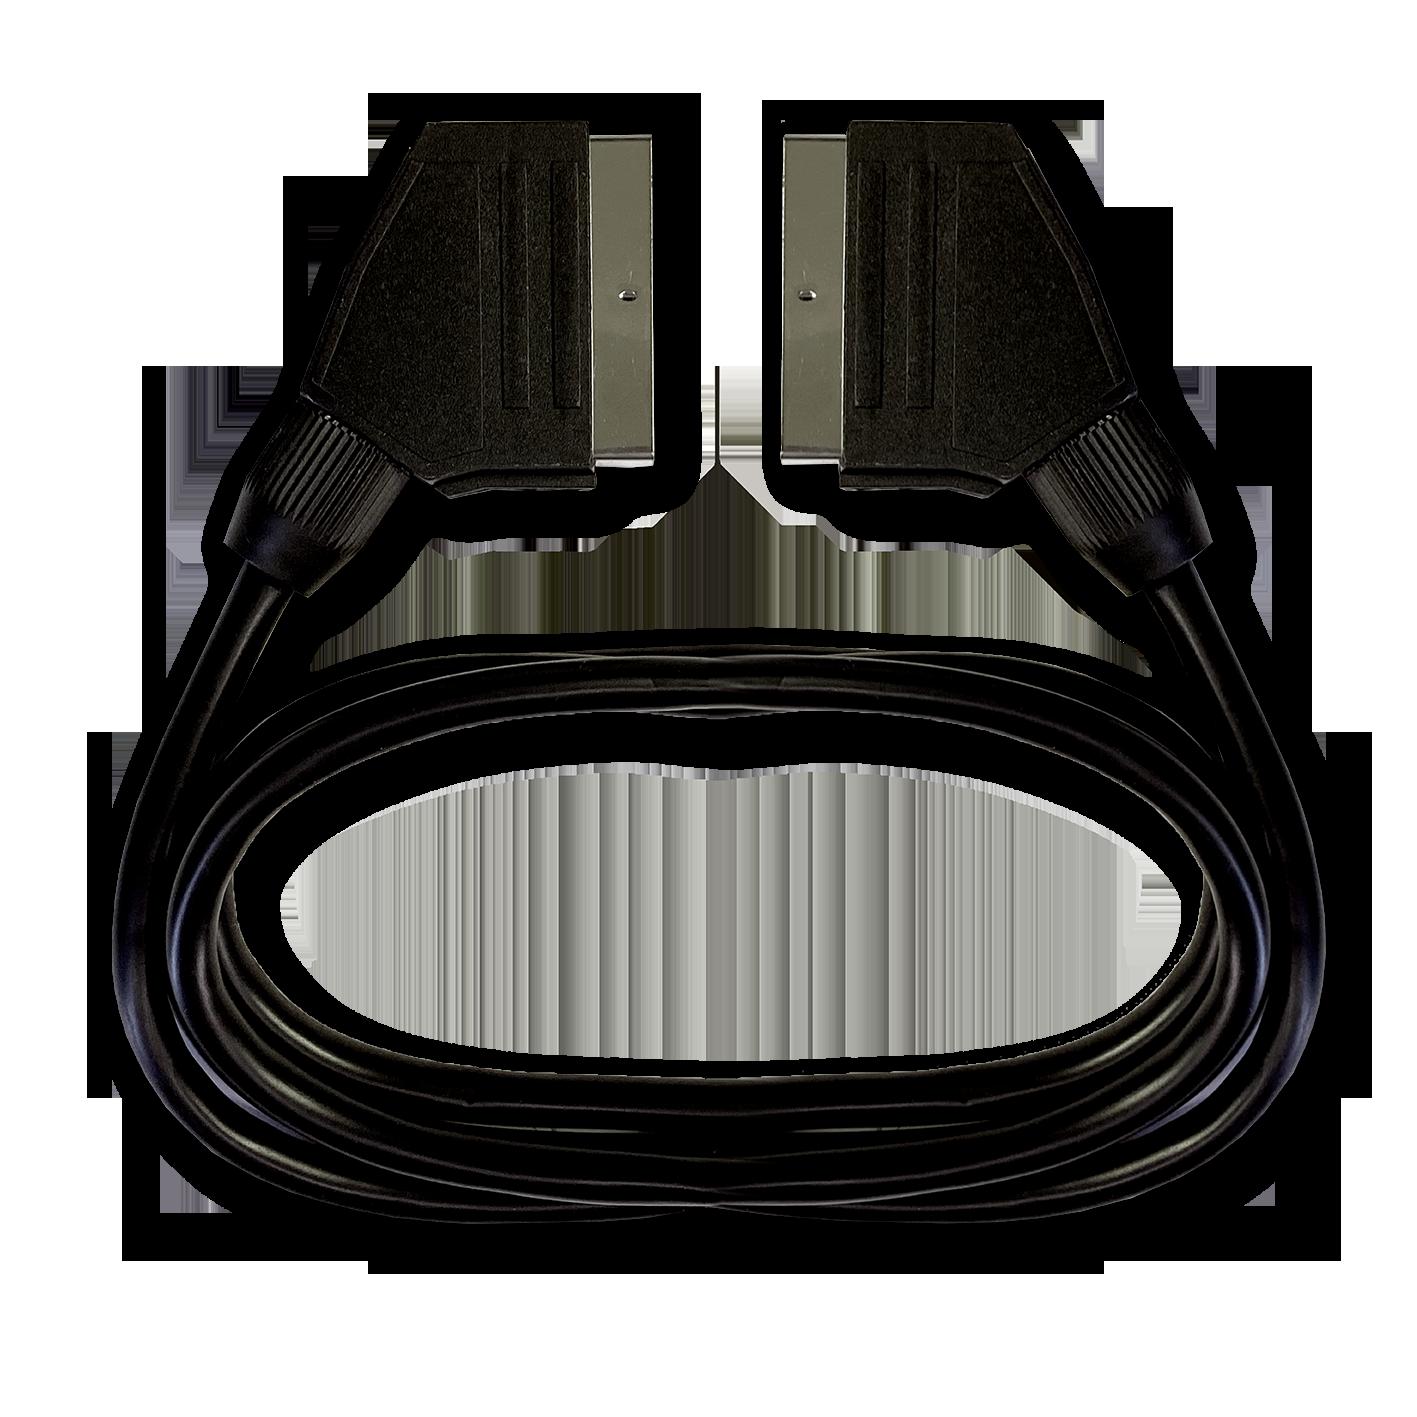 STARK kabl scart M-M (High Quality) 1.5m (Slika 4)